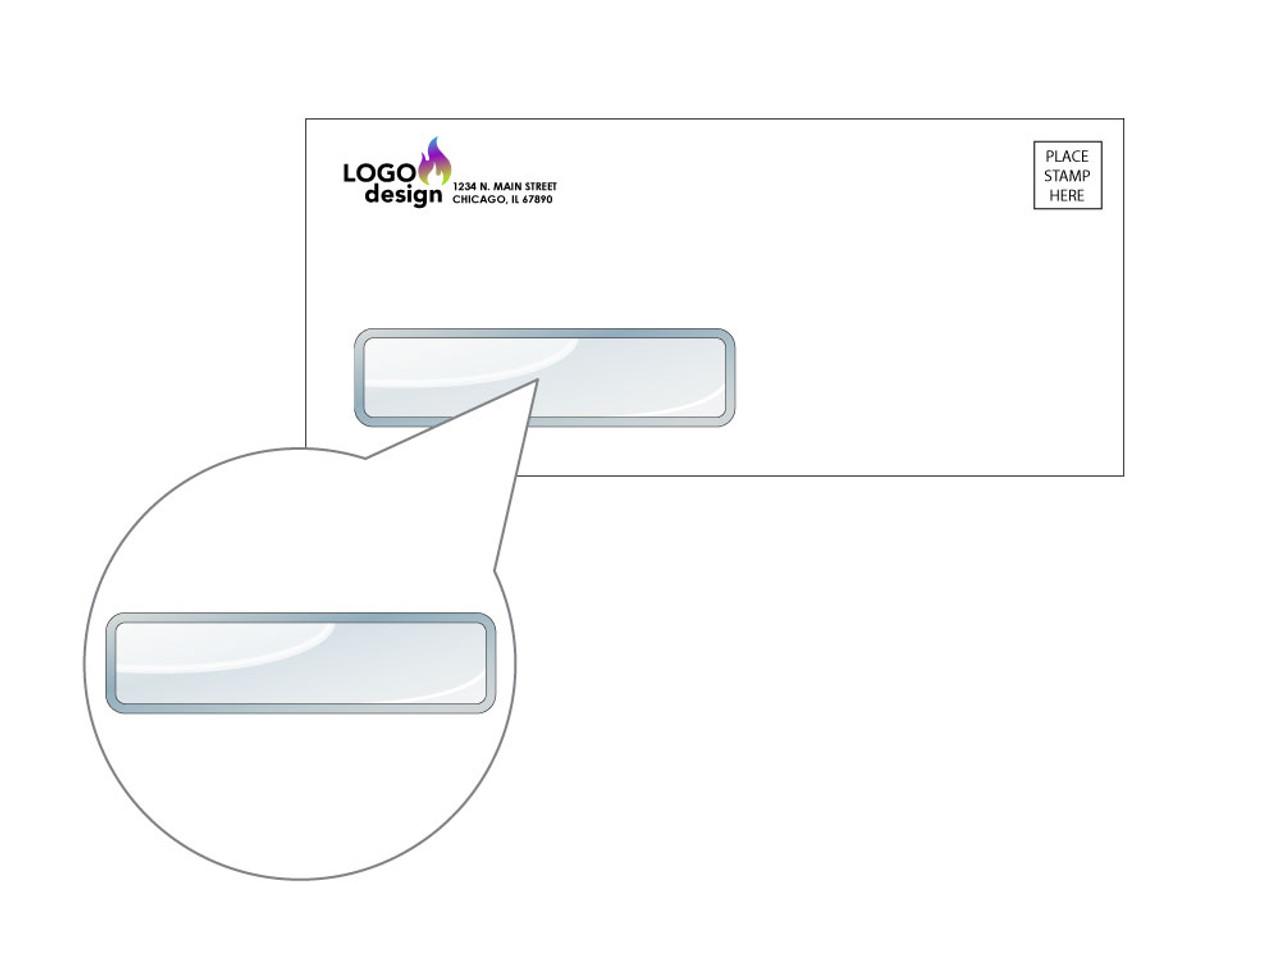 Custom #9 Window Envelopes - EN1041